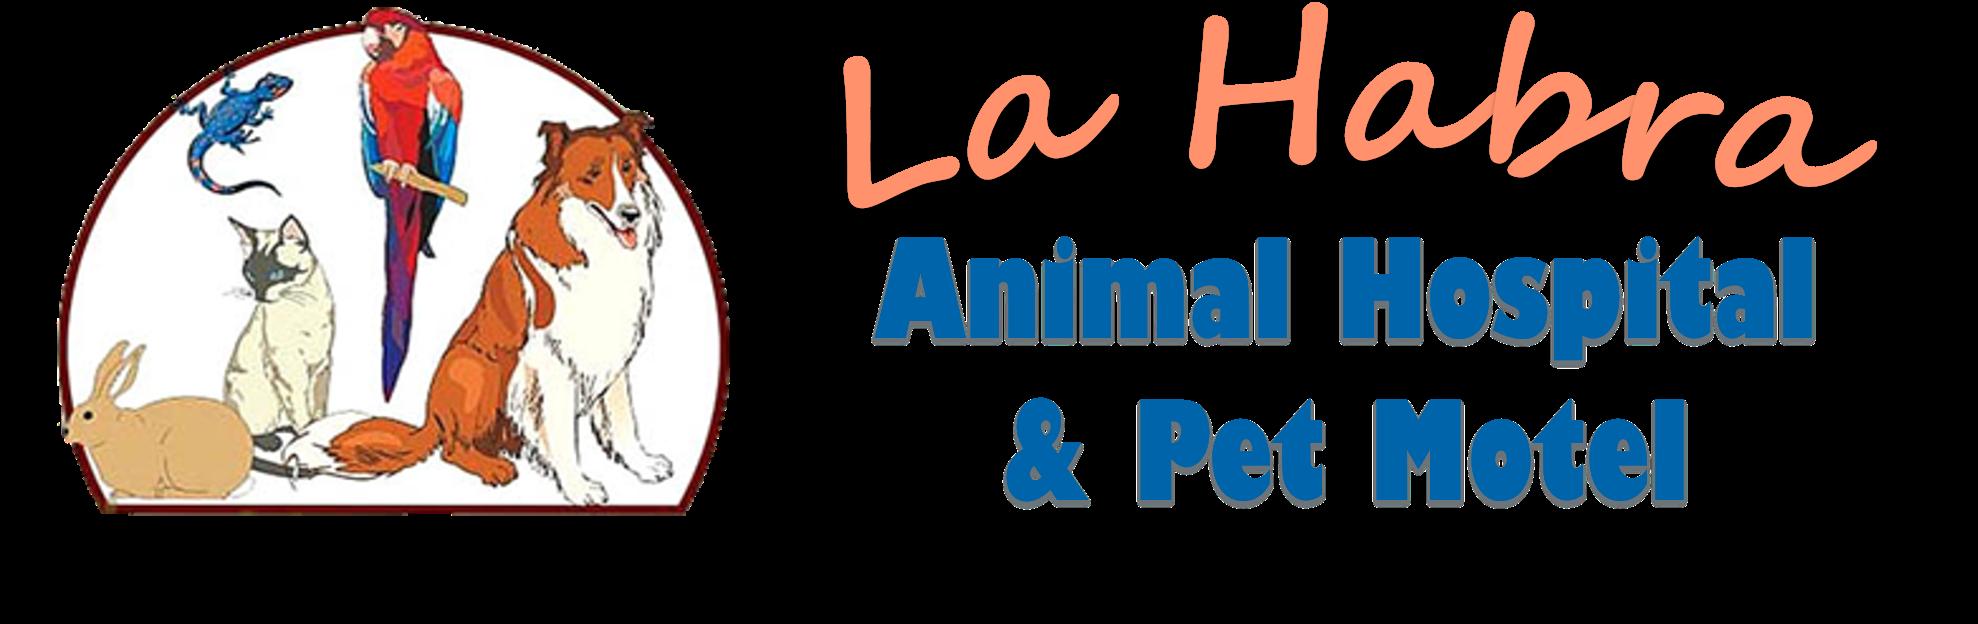 Dog doctor clipart black and white library Veterinarian in La Habra, CA | La Habra Animal Hospital & Pet Motel black and white library